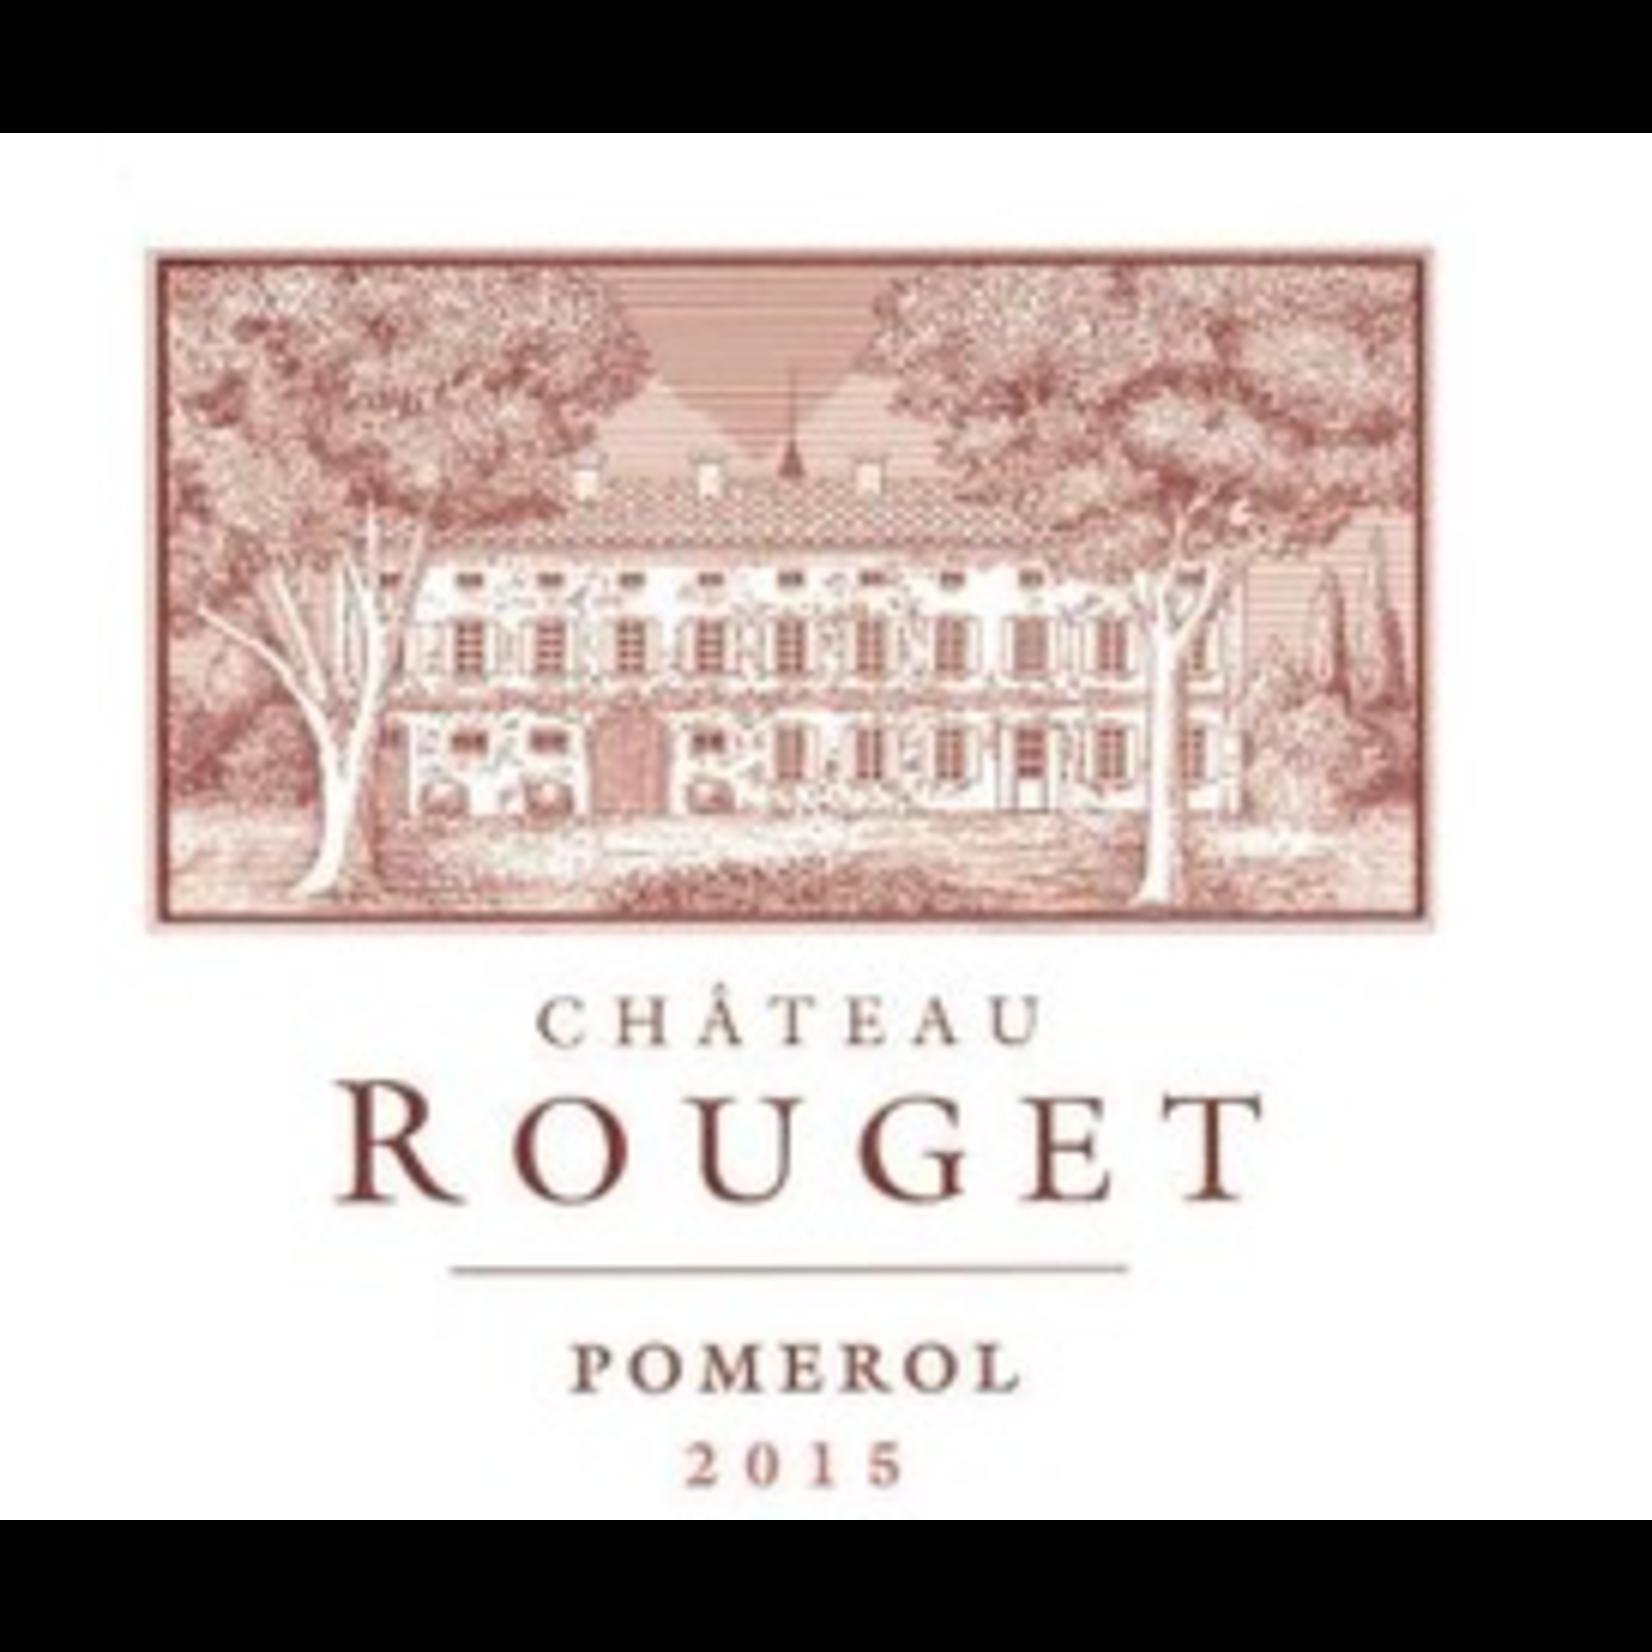 Wine Chateau Rouget Pomerol 2015